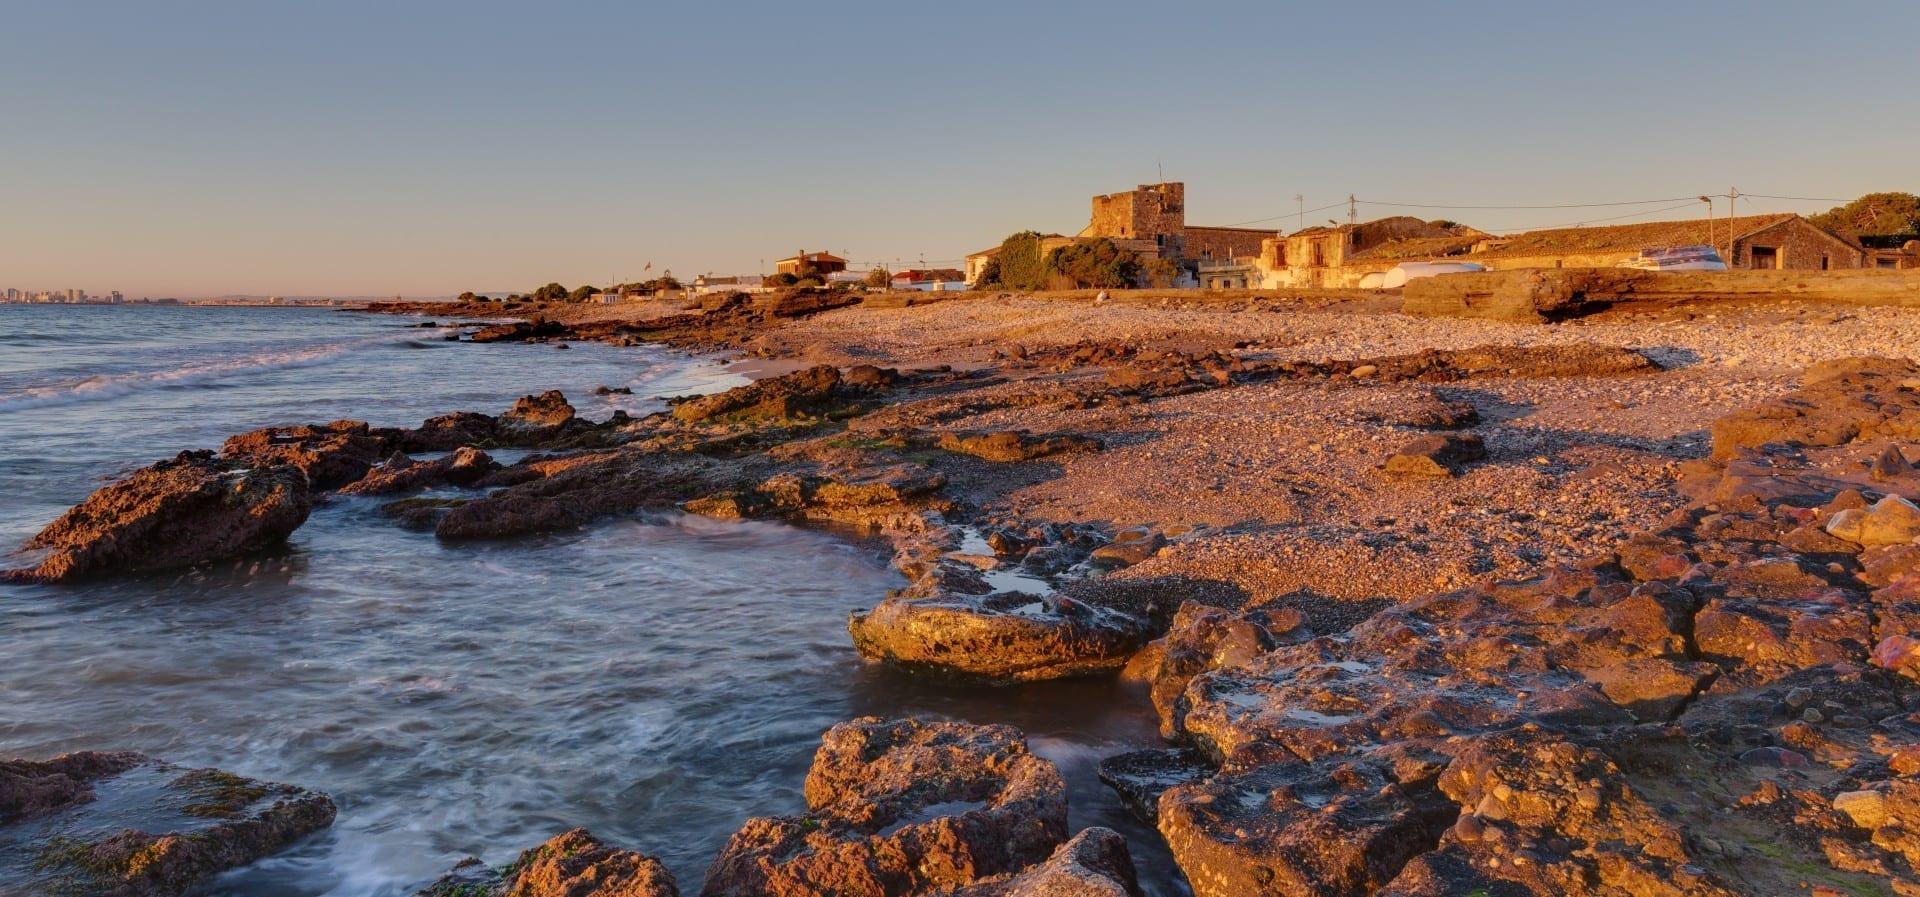 Grau Vell con su fortaleza Puerto de Sagunto España